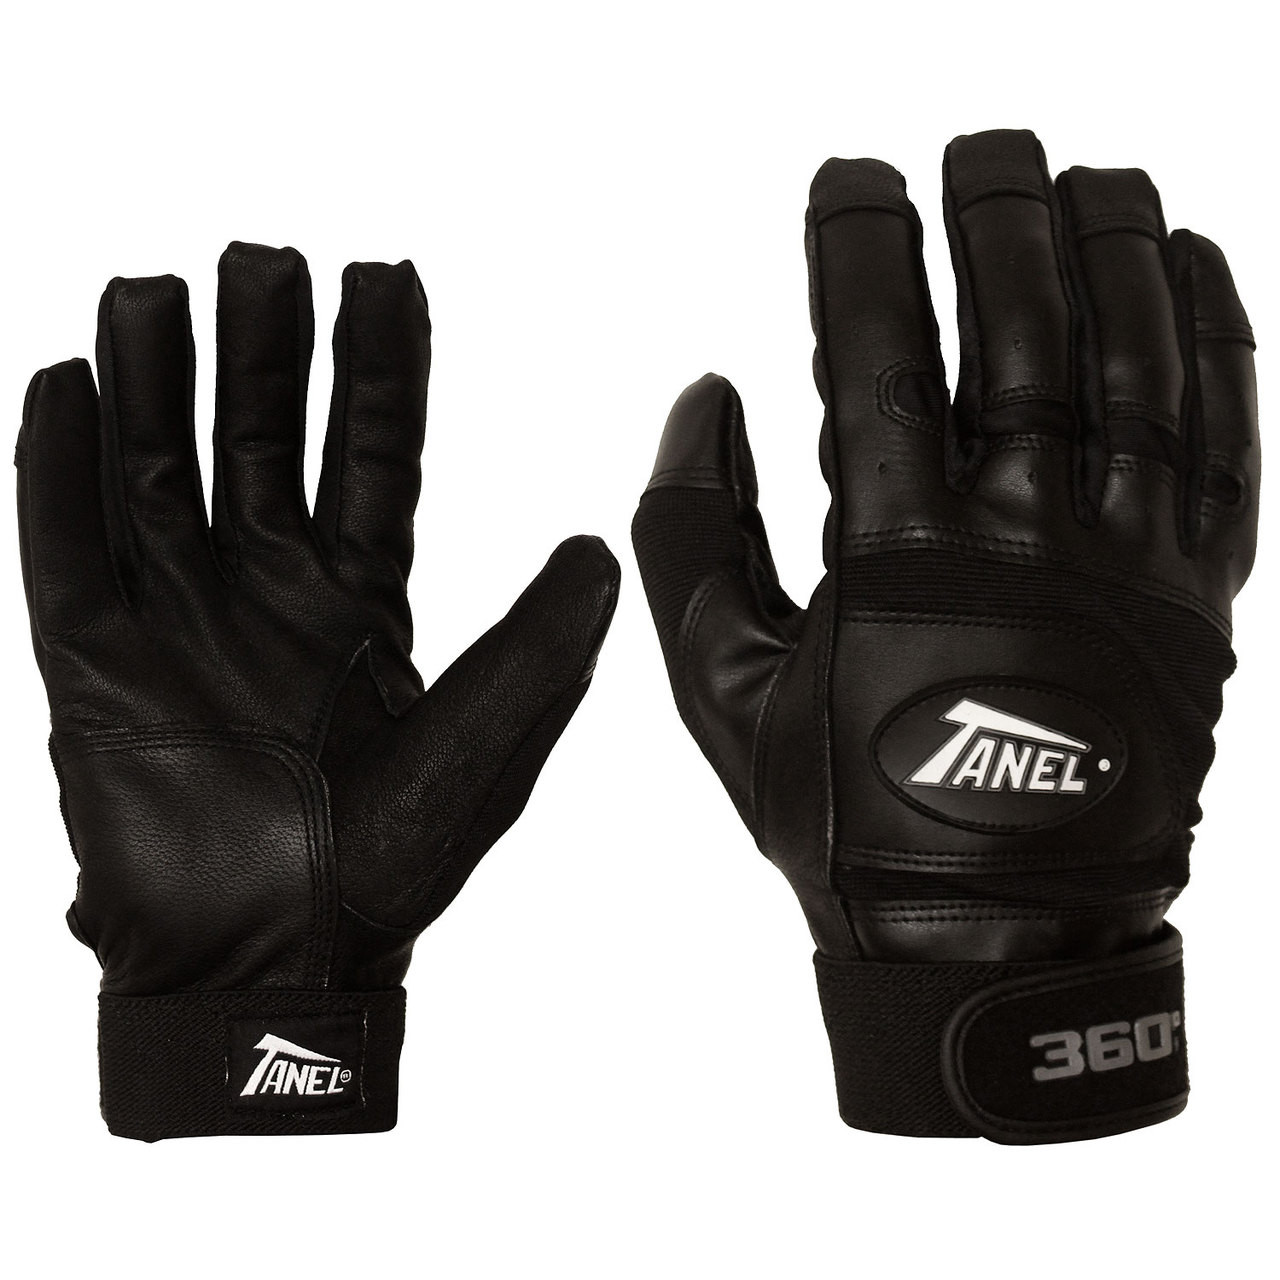 Black batting gloves - Smooth Grain Batting Gloves